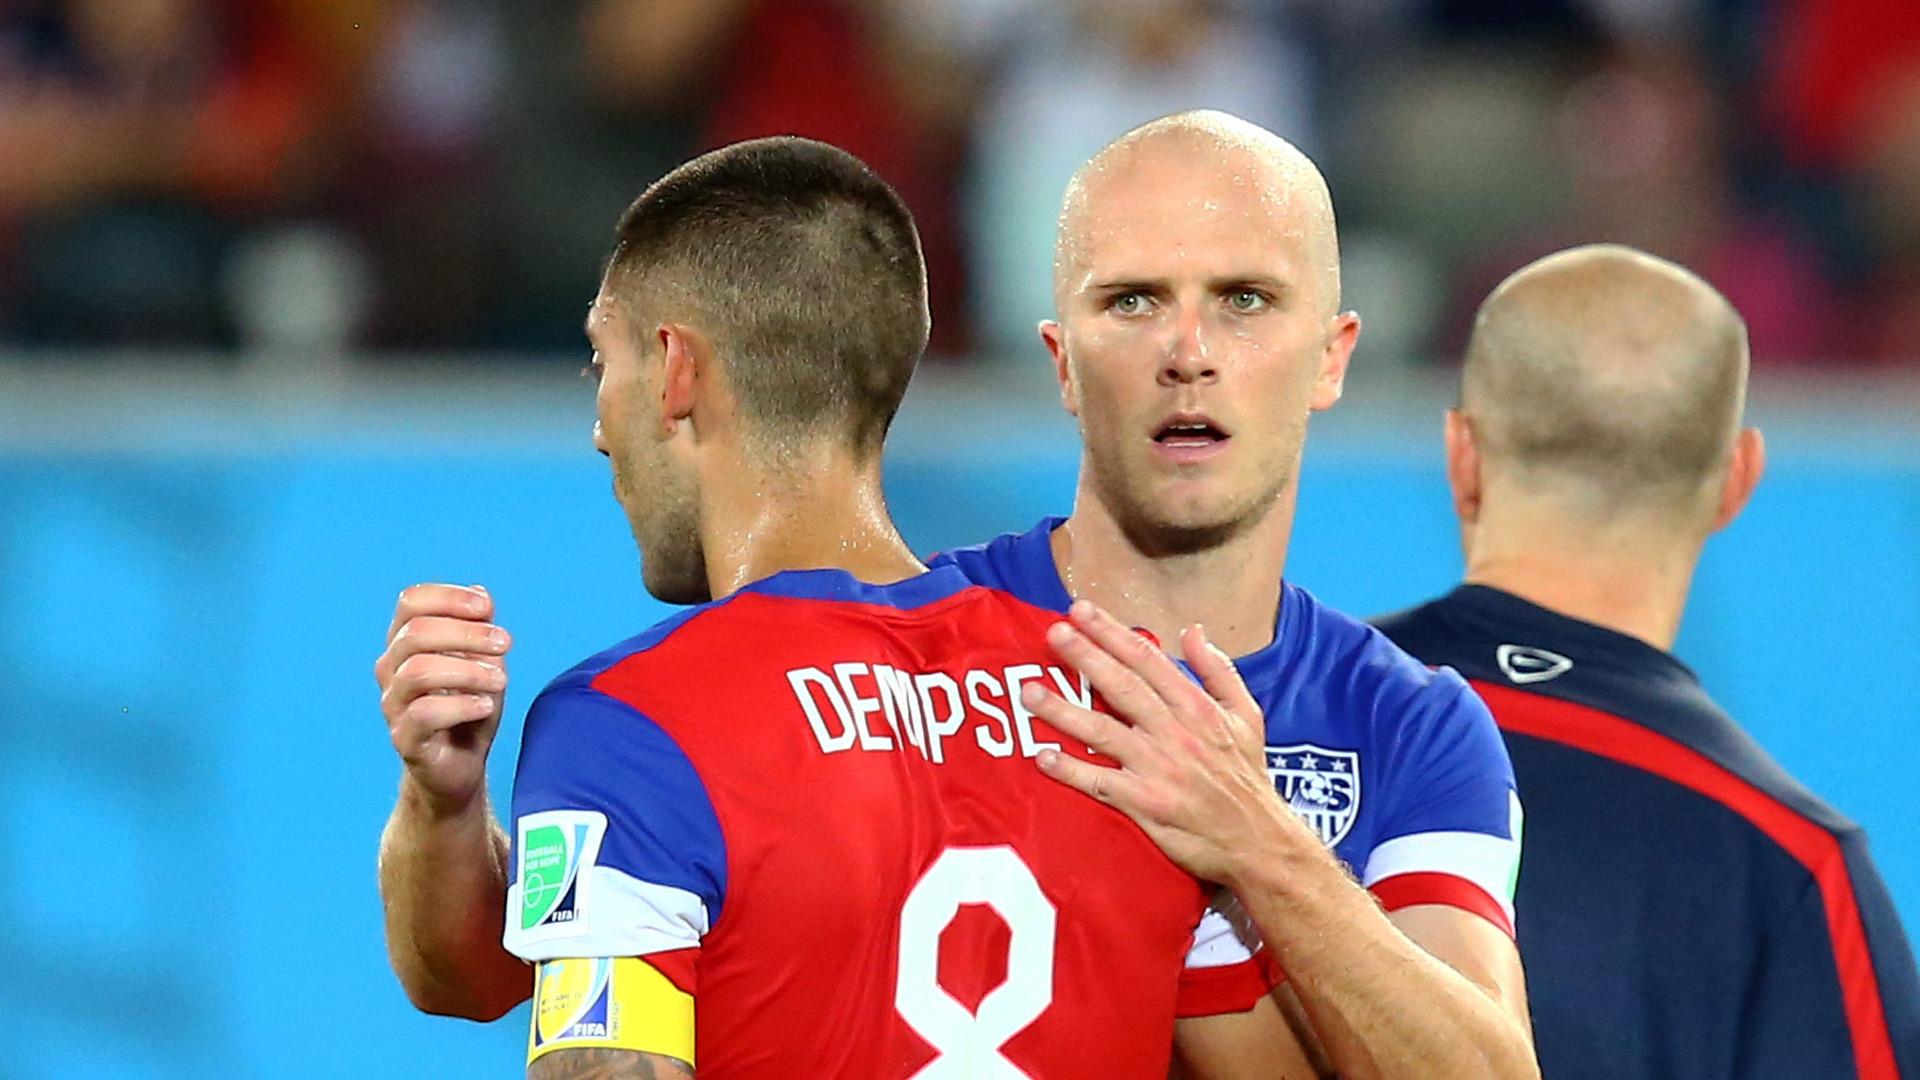 Clint Dempsey backs Michael Bradley as U.S. captain